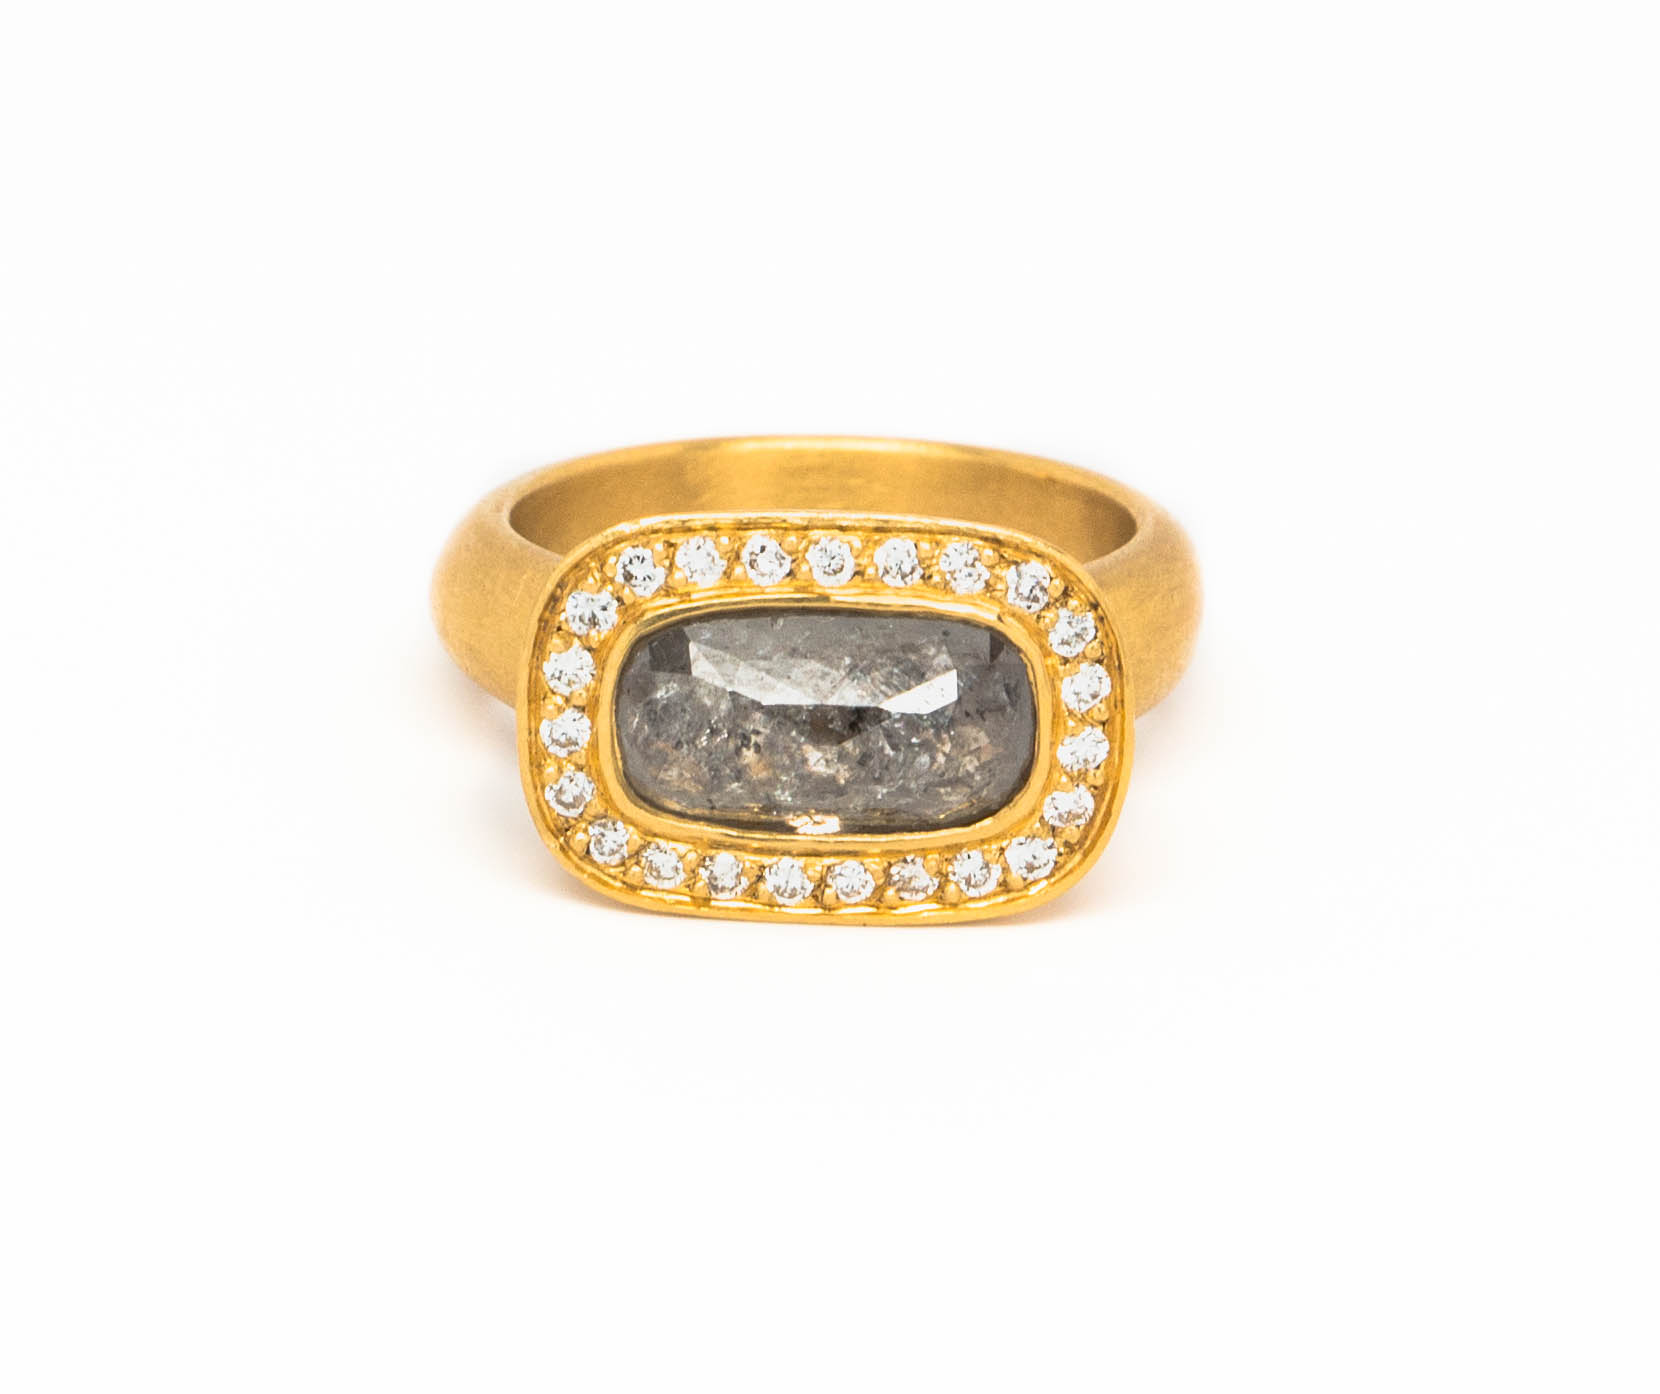 dec21 jewelry5-605.jpg